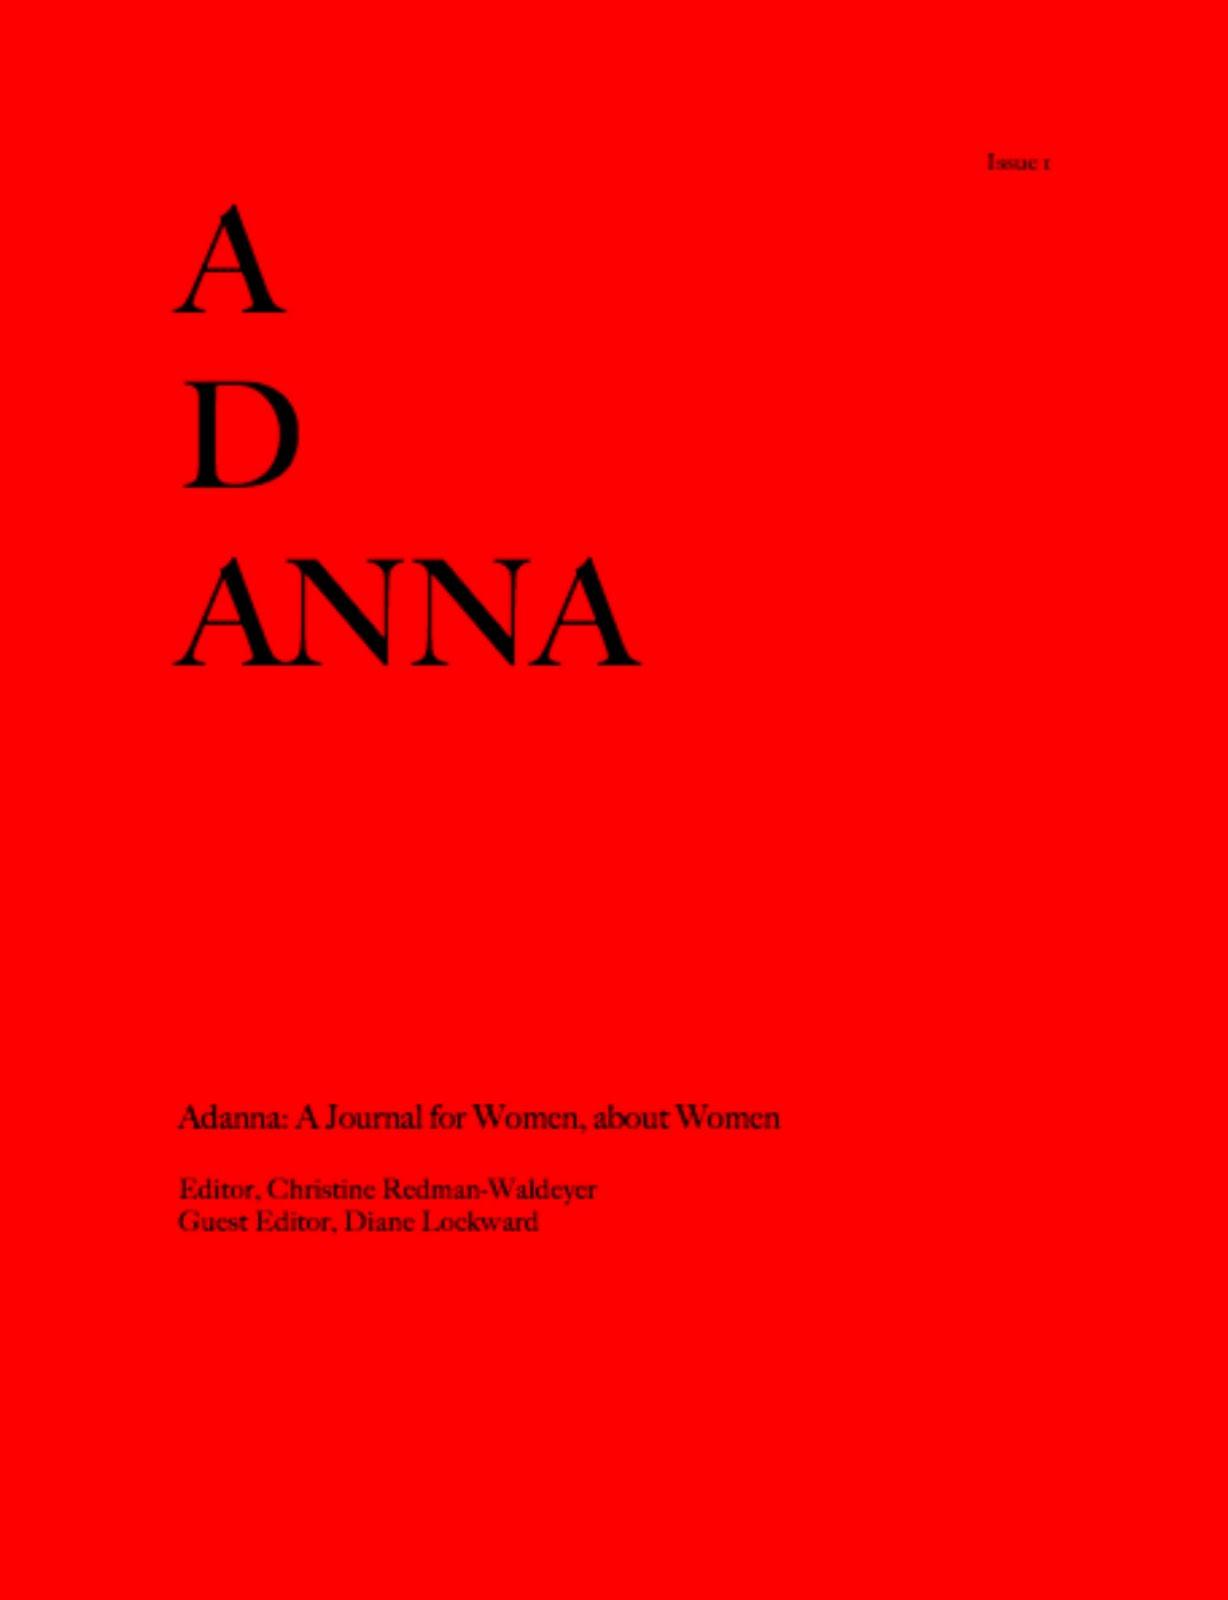 Adanna cover.jpg